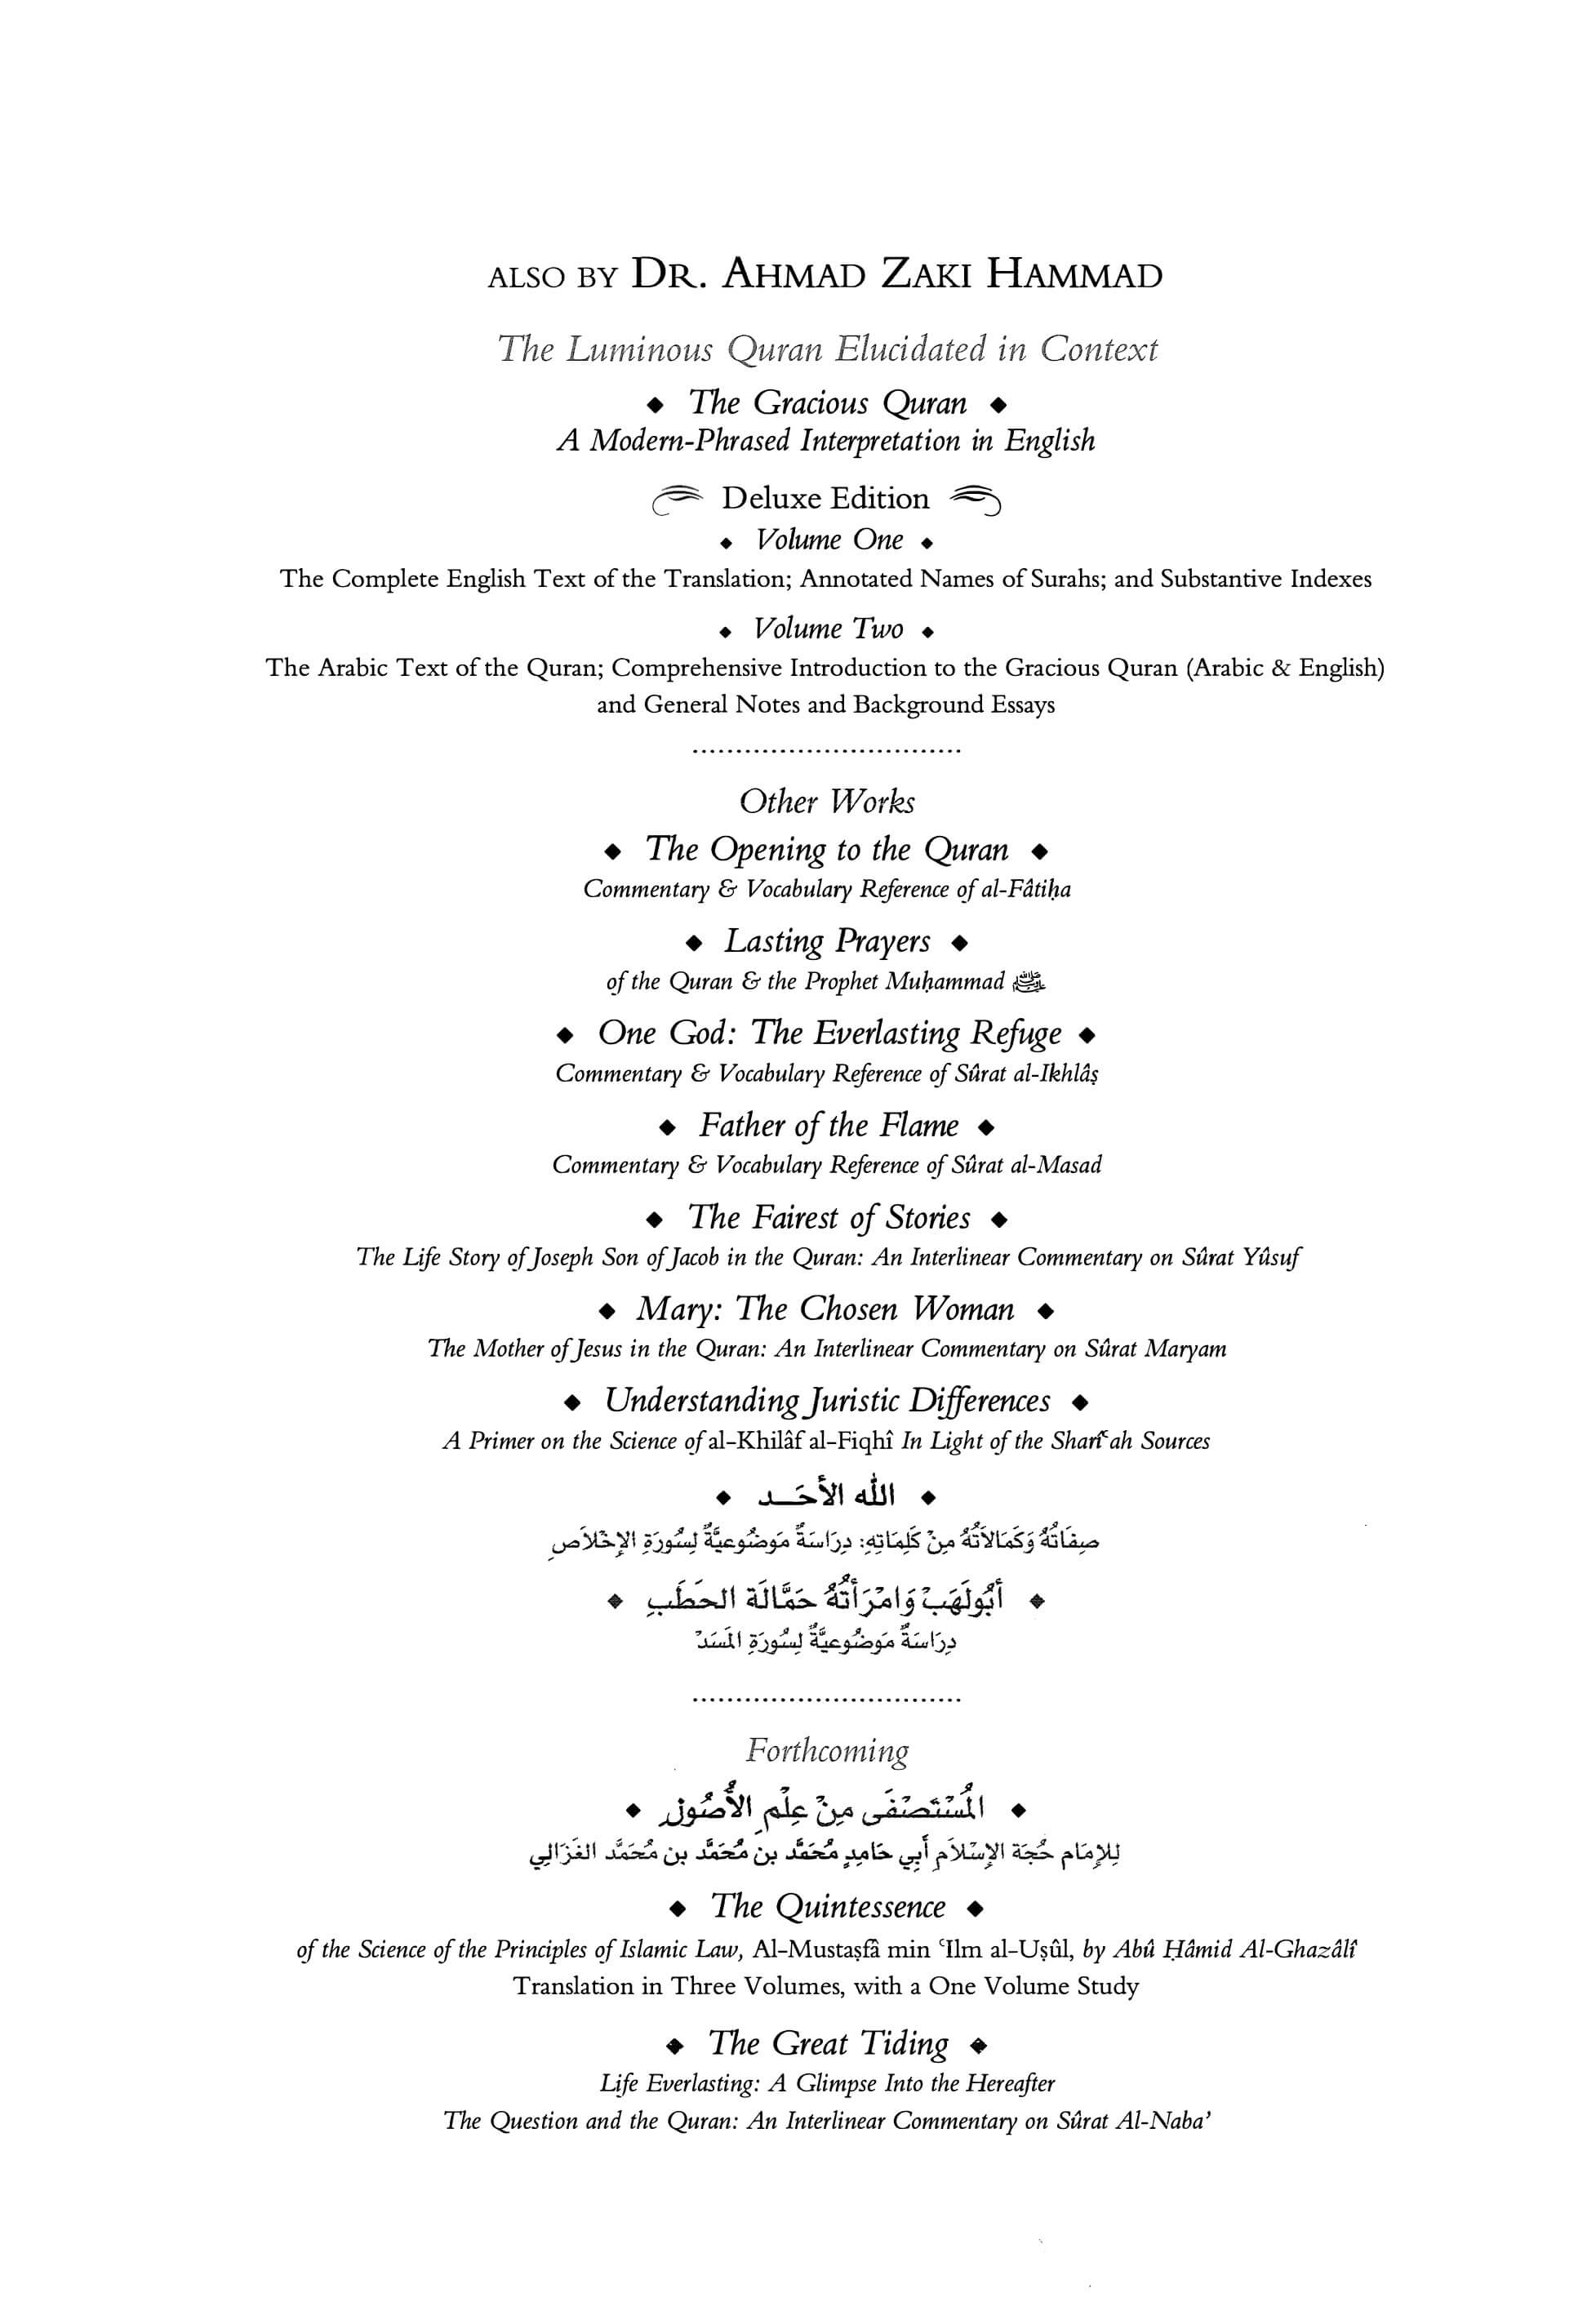 Ahmed Zaki Hammad 2008 Quran Explorer, Page 2